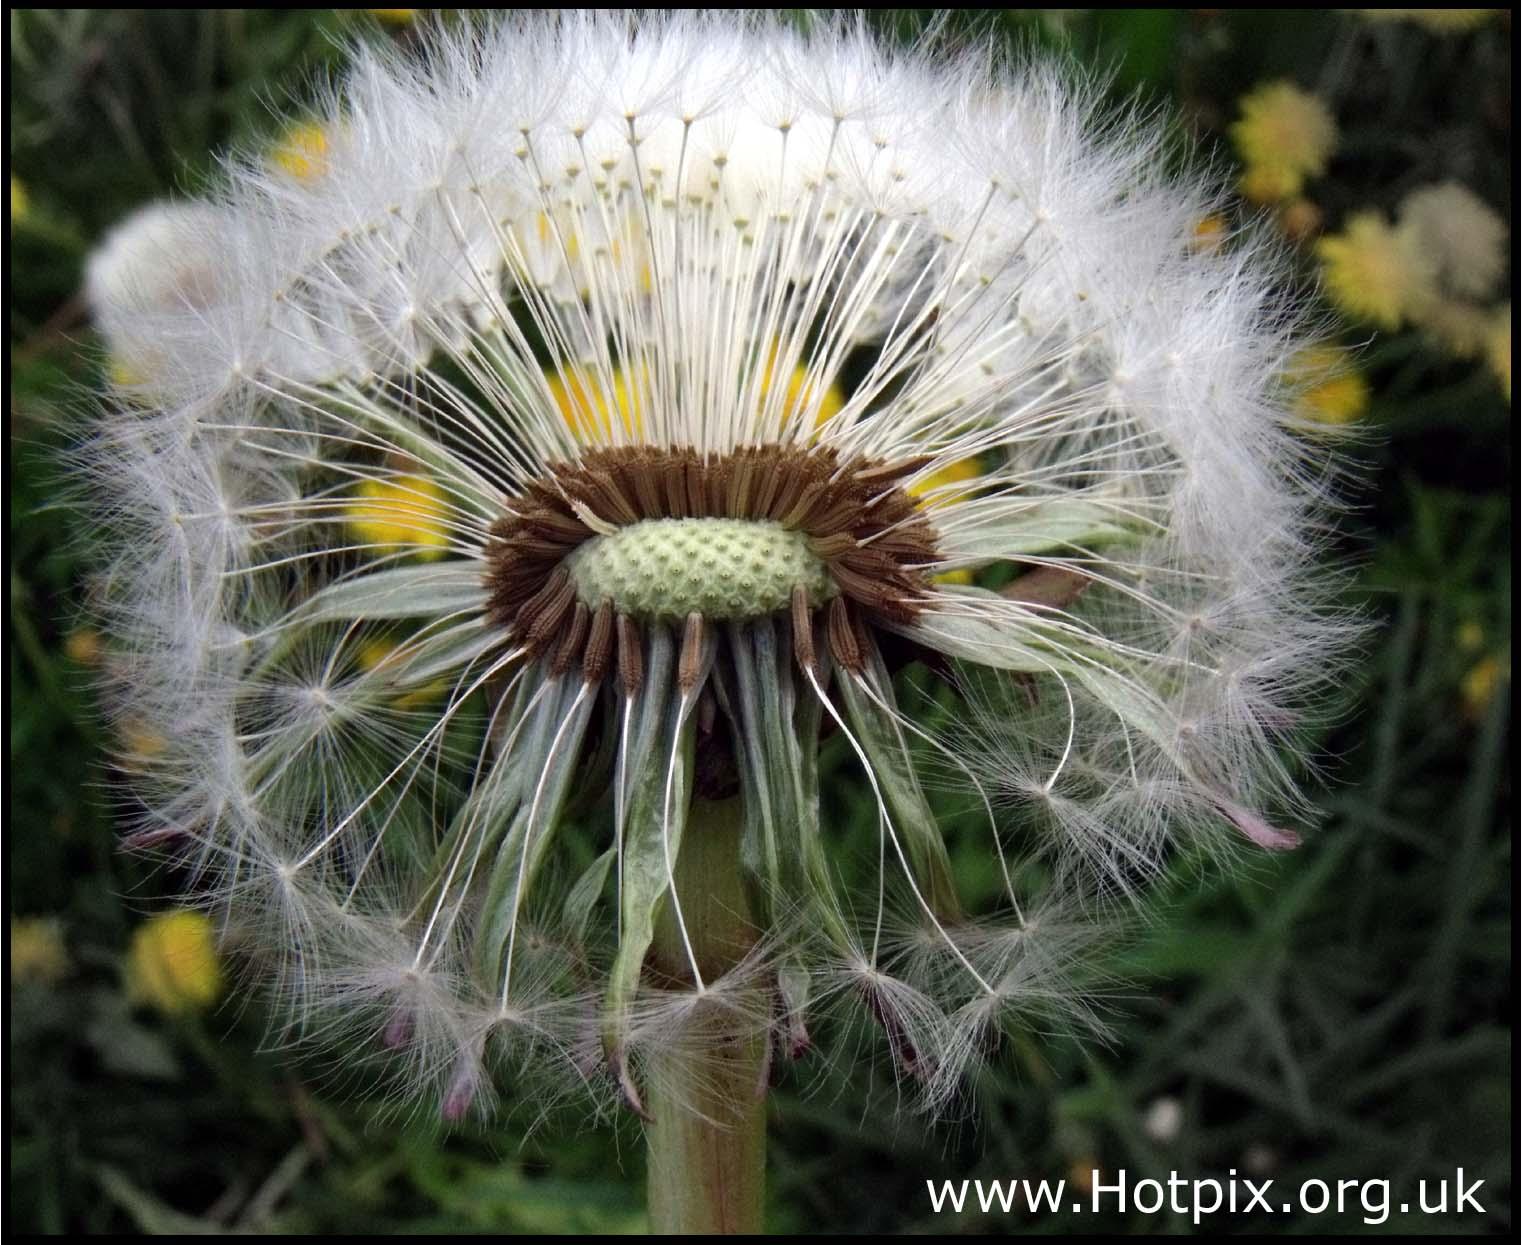 weed,wild,uk,england,english,flower,warrington,GB,nature,macro,close,up,closeup,tubes,tube,bellow,bellows,ColorPhotoAward,hotpix!